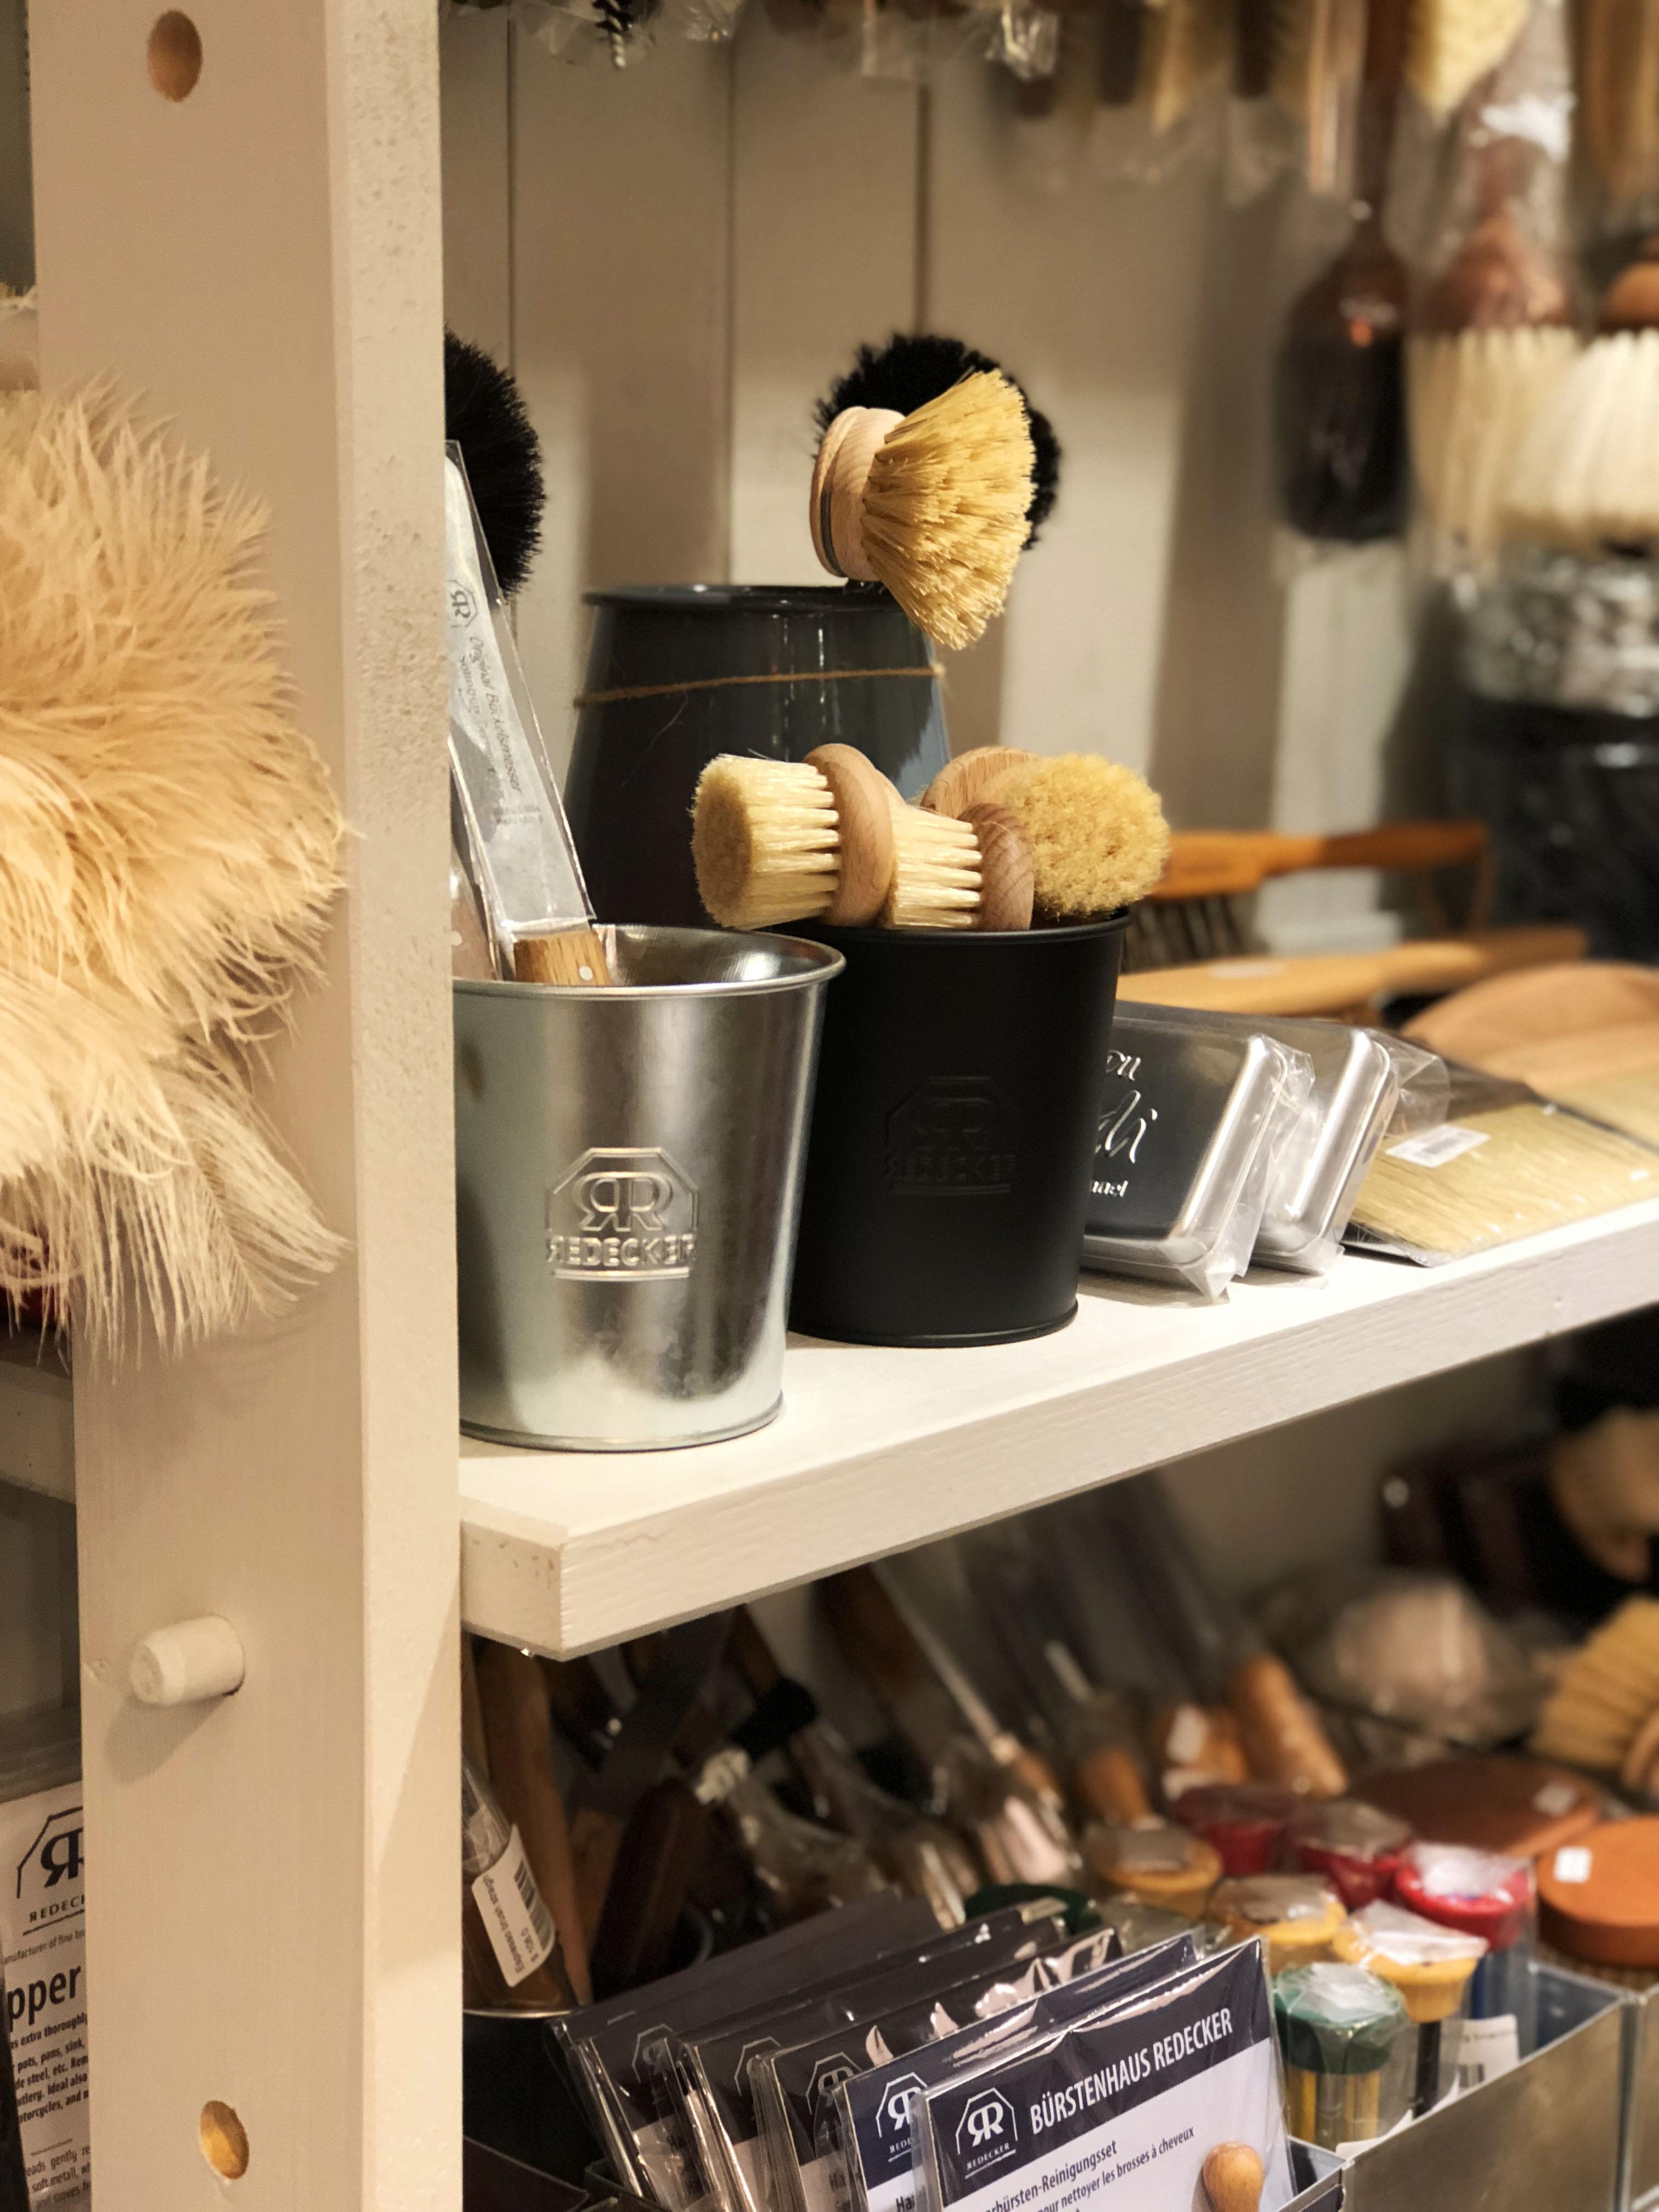 Gorilla Store 為未來 添置 日用品 選物